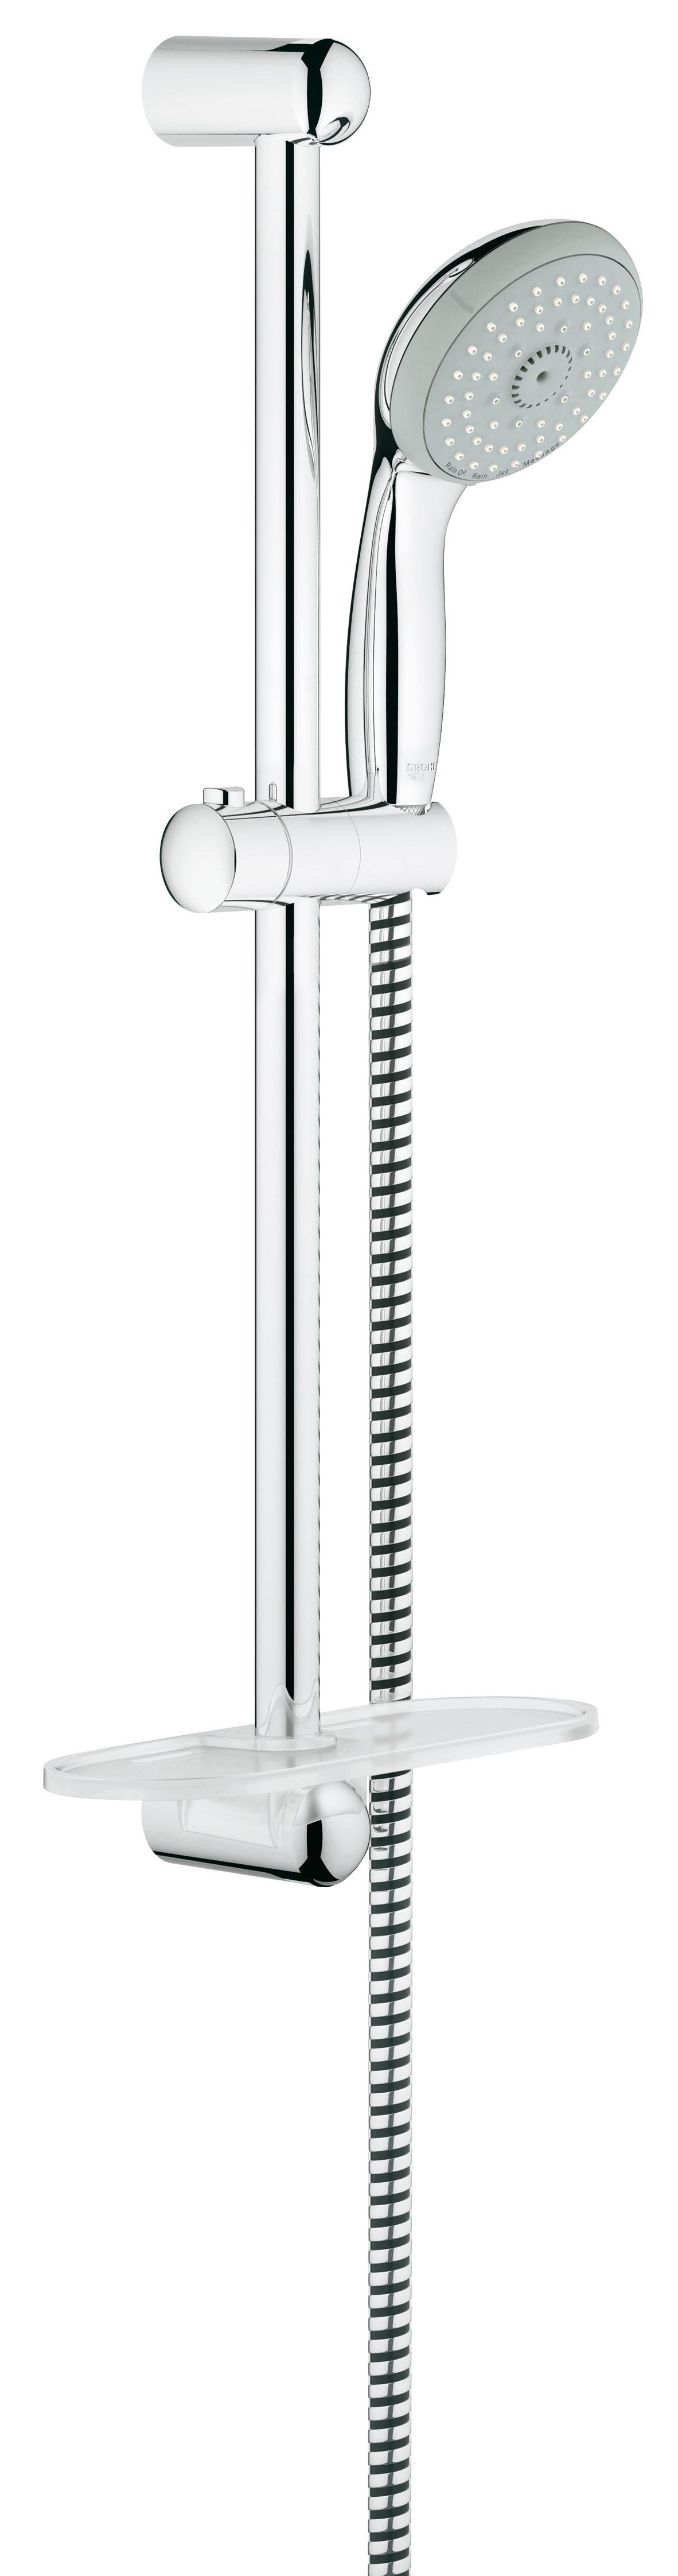 Grohe 28593001 Tempesta Classic (ручной душ, штанга 600 мм, шланг 1750 мм), хром